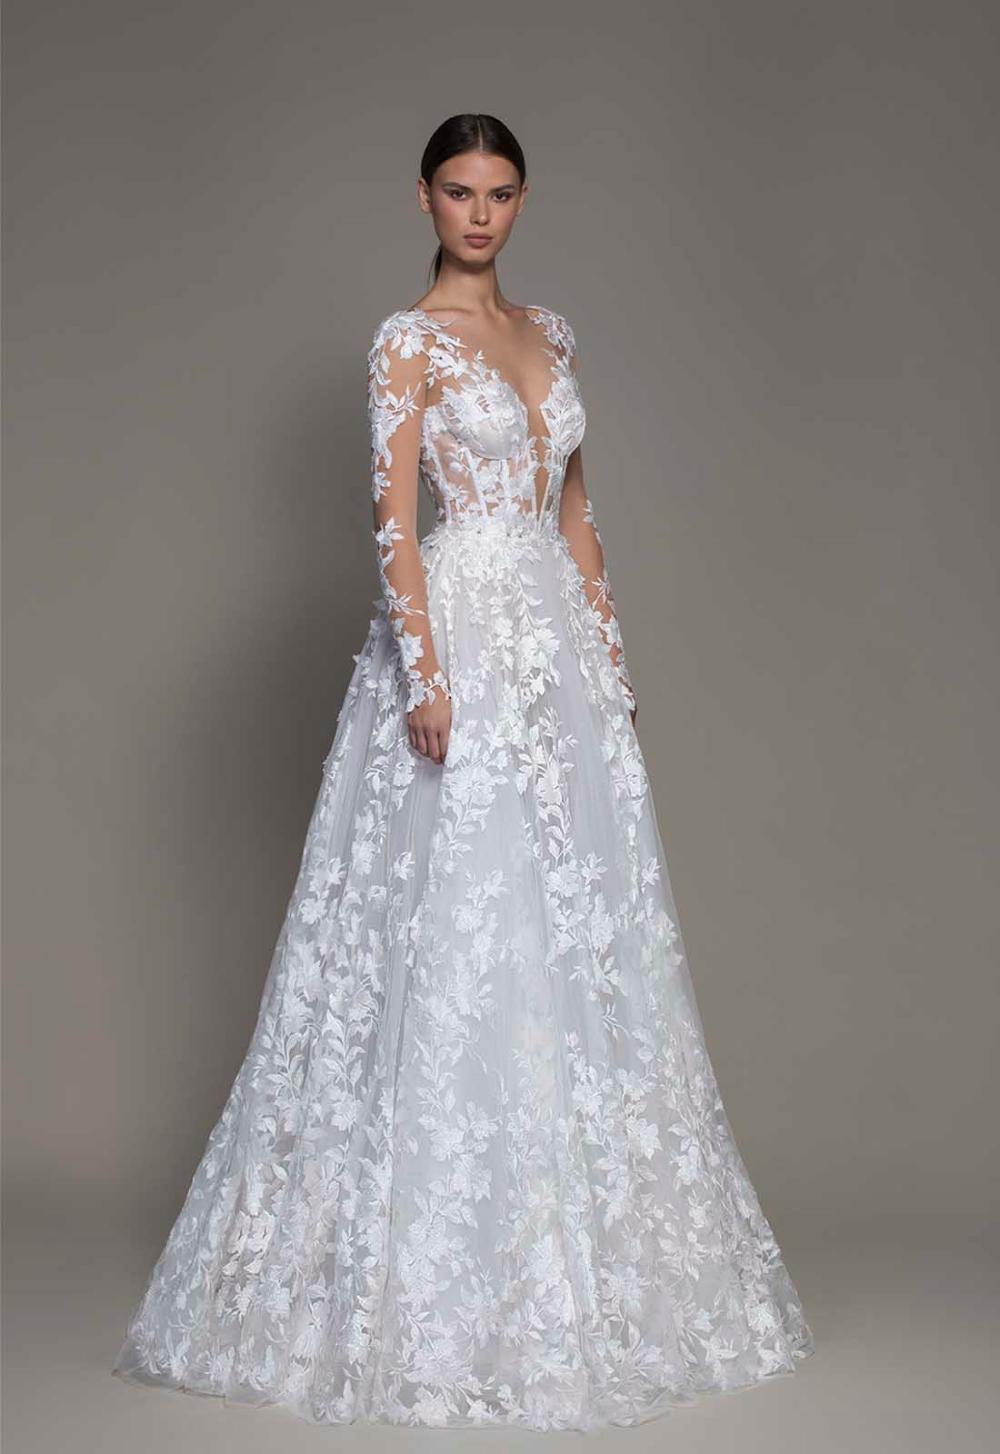 Usa Replications Of Wedding Dresses Inspired Designer Evening Gowns Pnina Tornai Wedding Dress Wedding Dresses